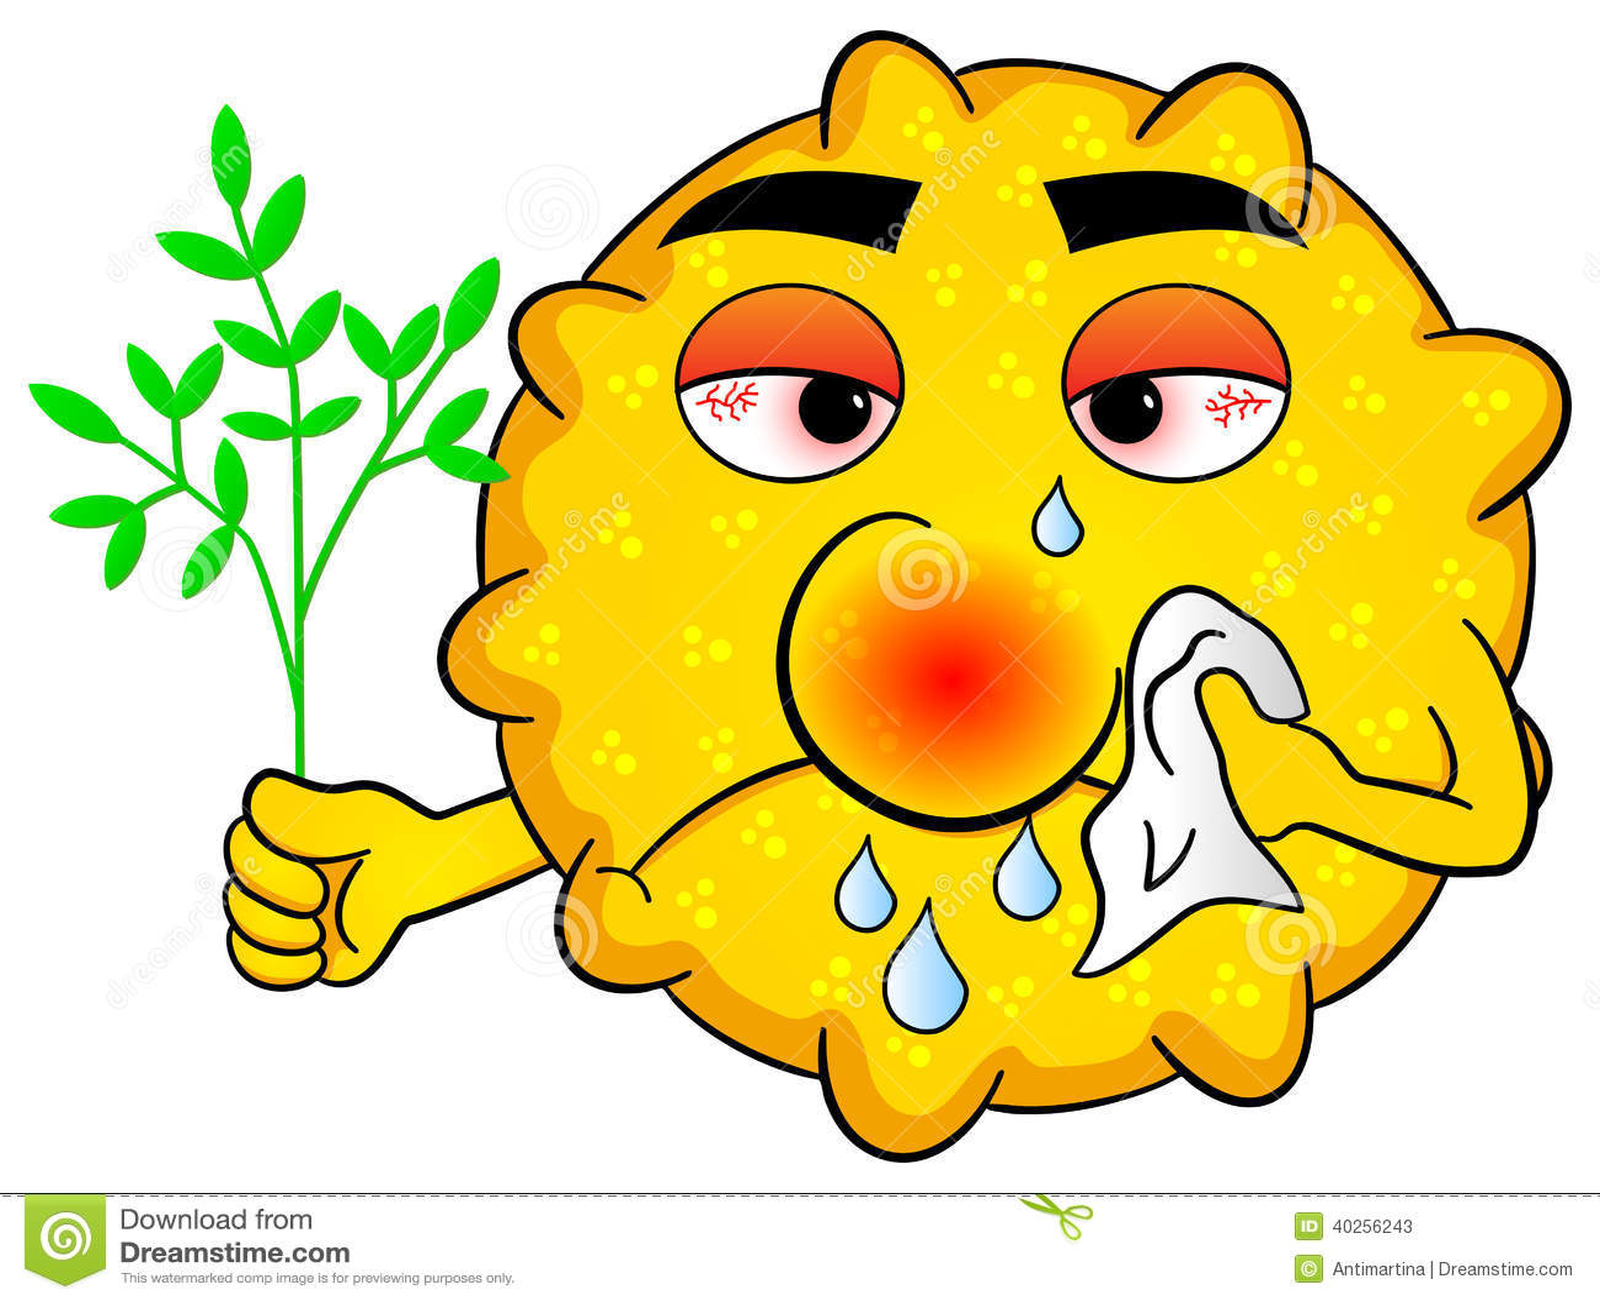 https://thumbs.dreamstime.com/z/pollen-hay-fever-vector-illustration-40256243.jpg